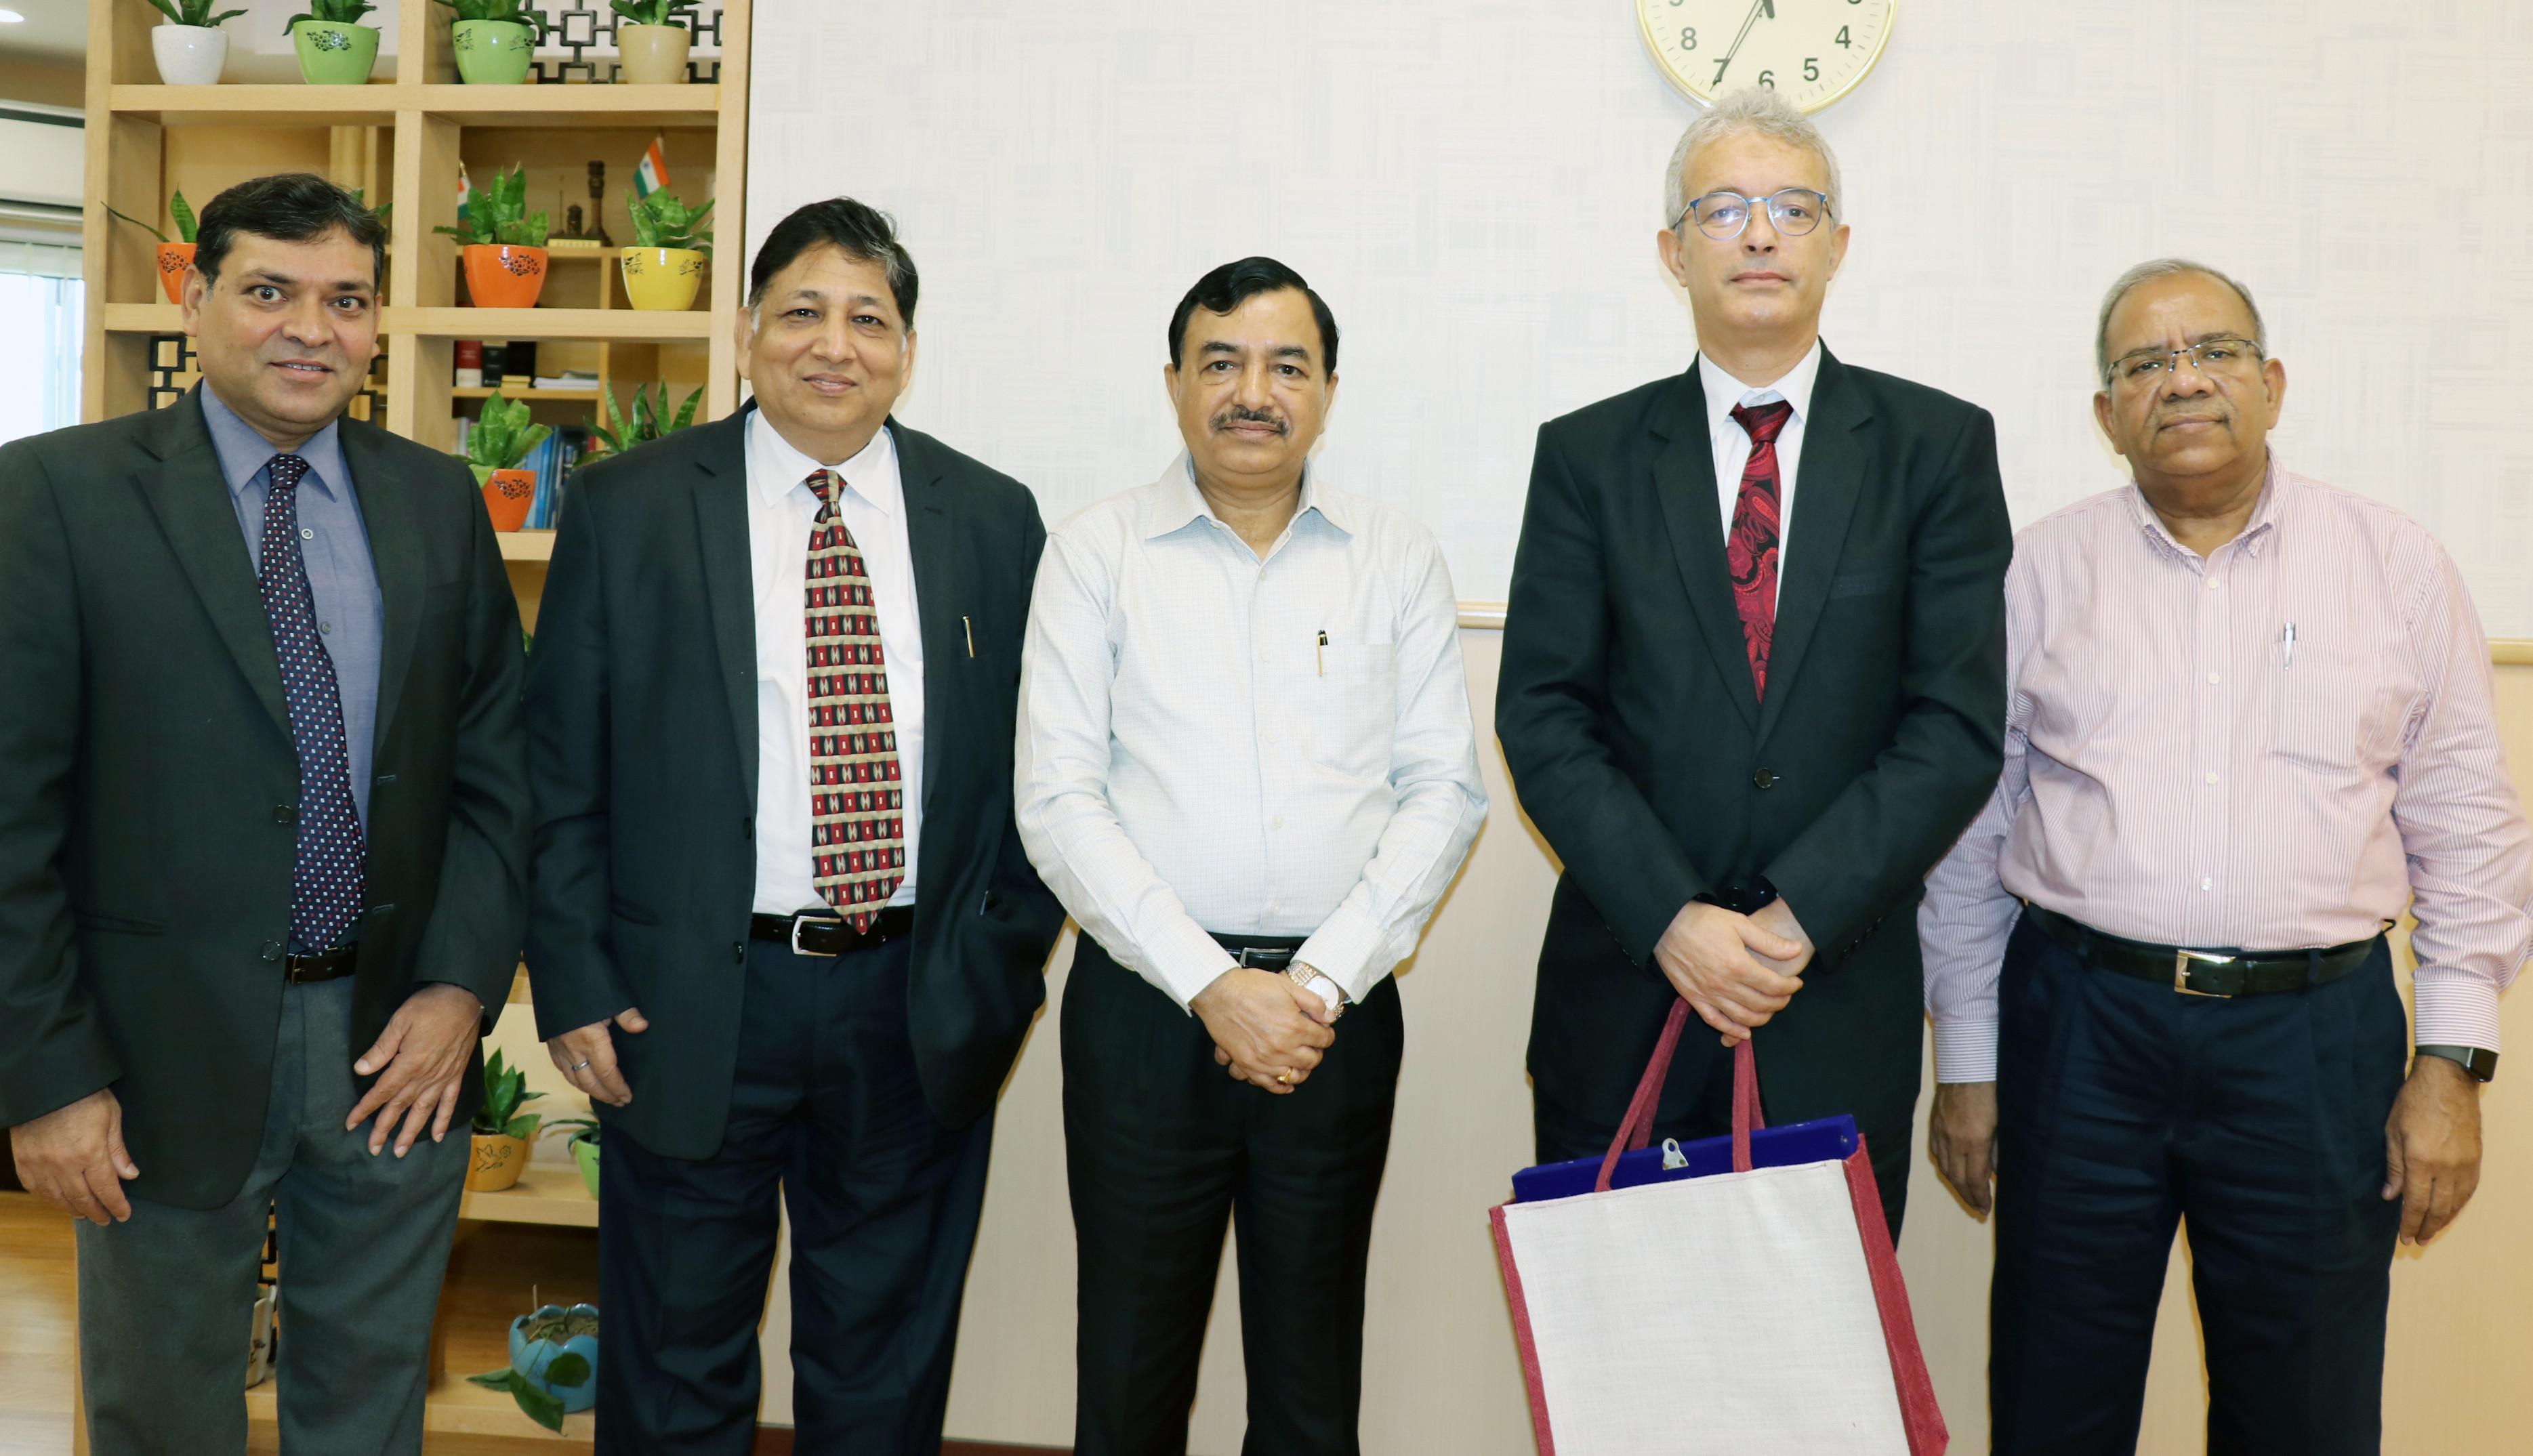 Mr. Najmeddine Lakhal, Ambassador of Tunisia to India met Mr. Sushil Chandra, Election Commissioner of India on 17th July, 2019.